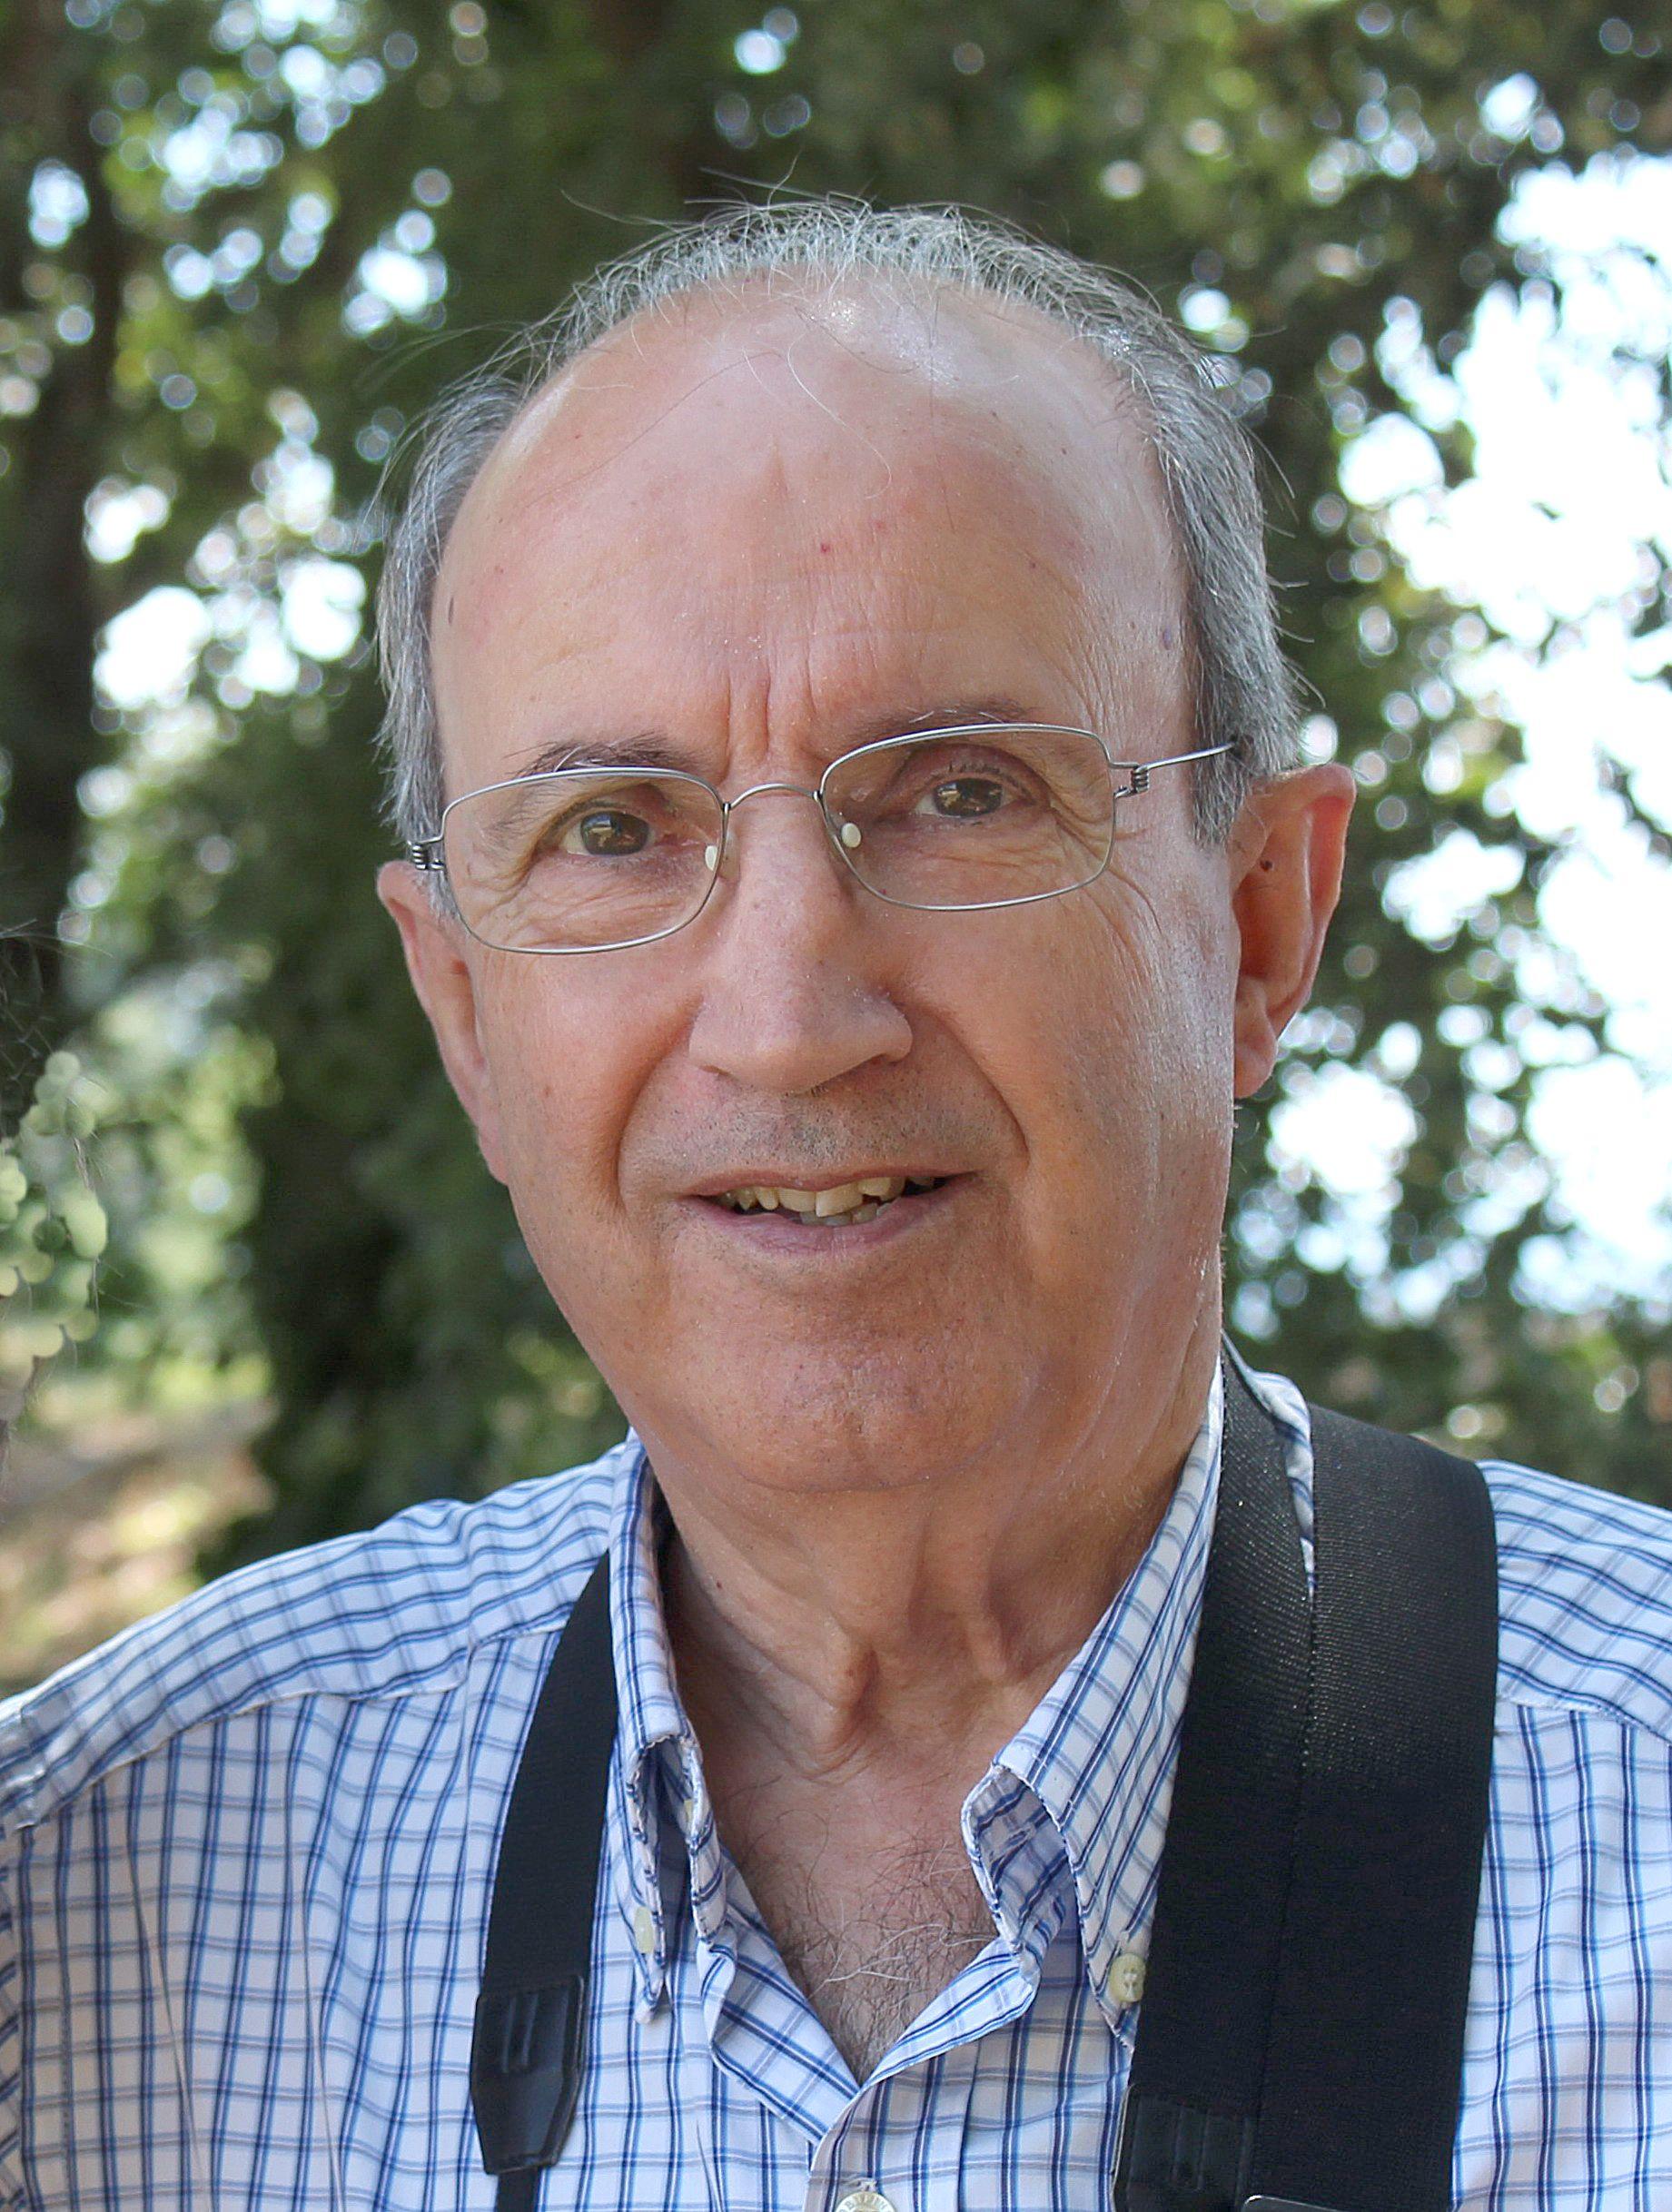 Jaume Vinyals Rovira